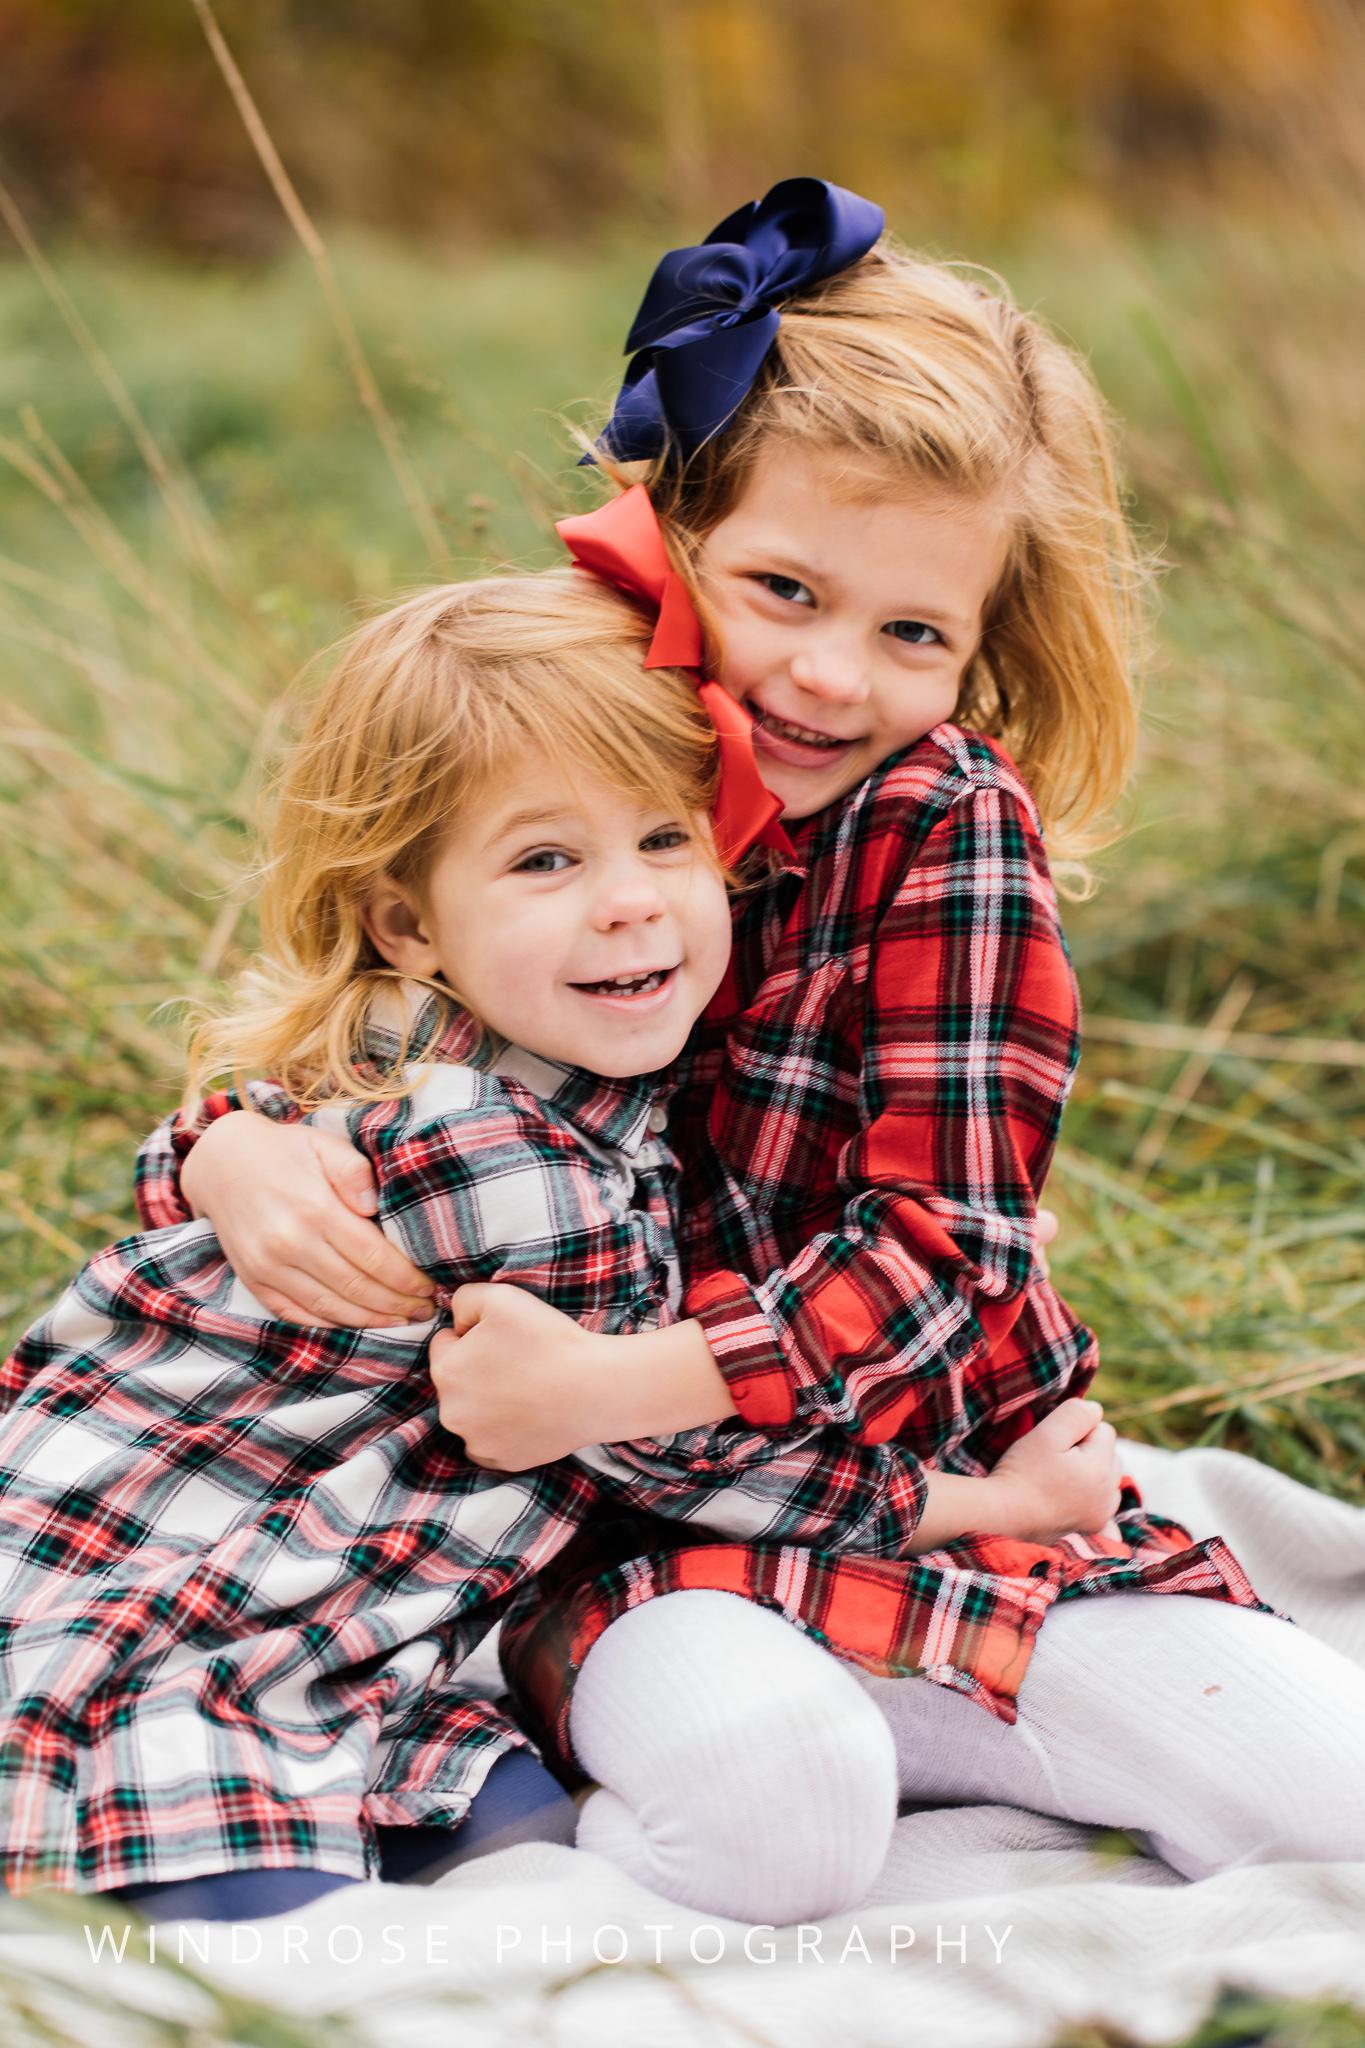 Fall-Family-Portrait-Session-Byron-MN-7.jpg